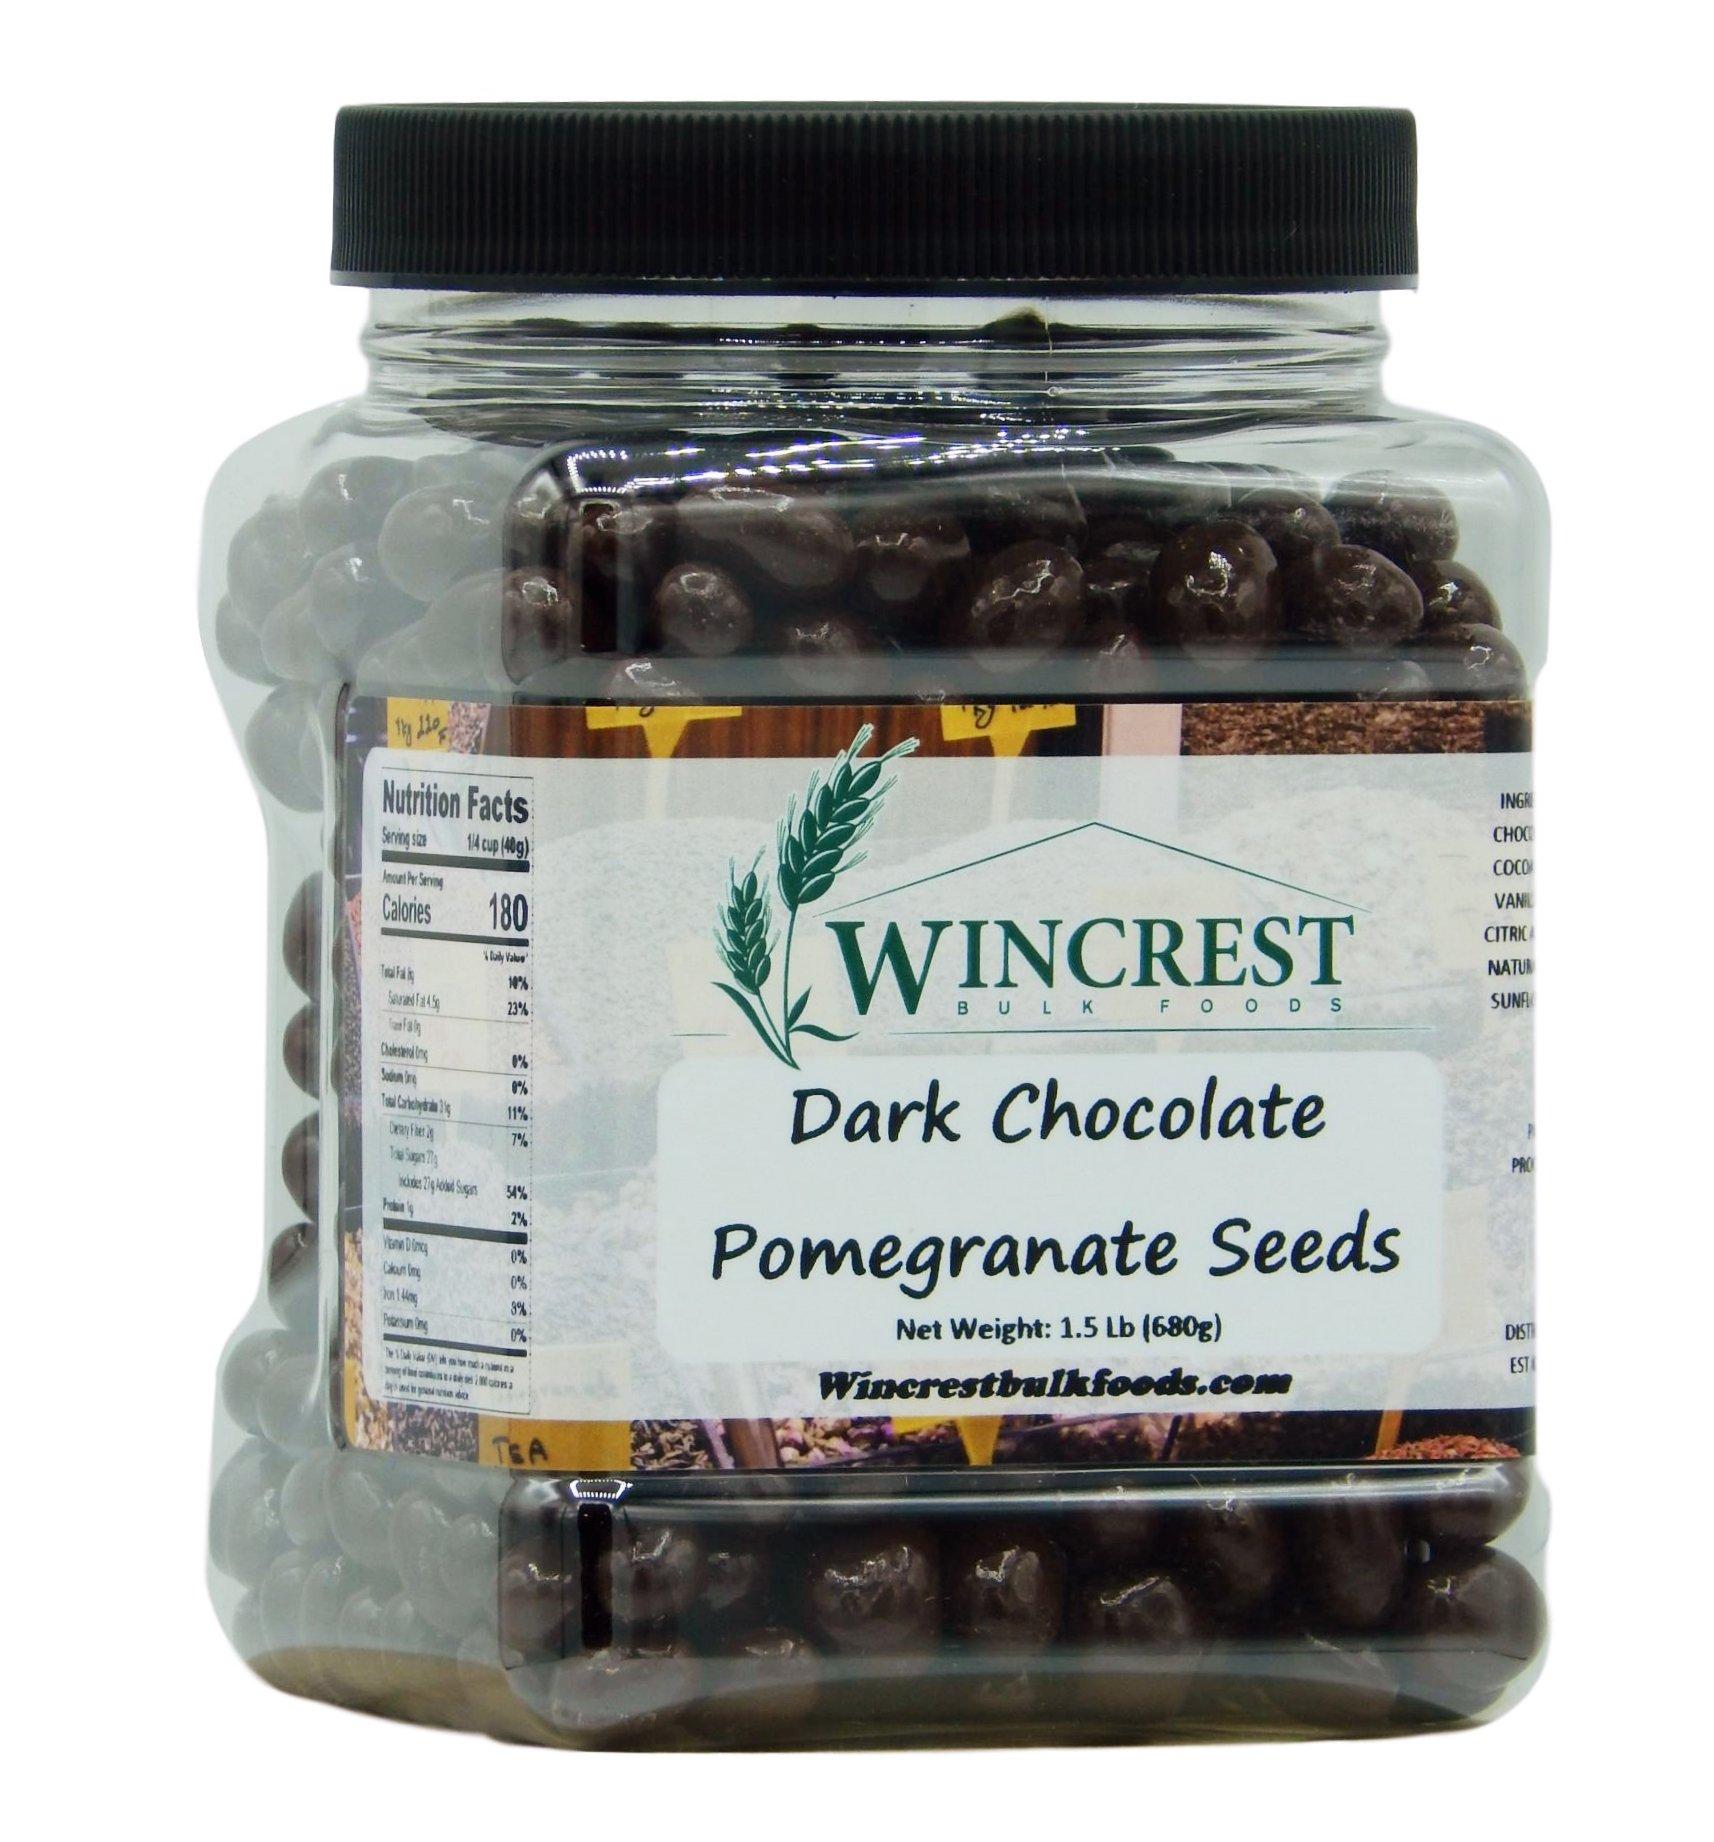 Dark Chocolate Covered Whole Pomegranate Seeds (Arils) - 1.5 Lb